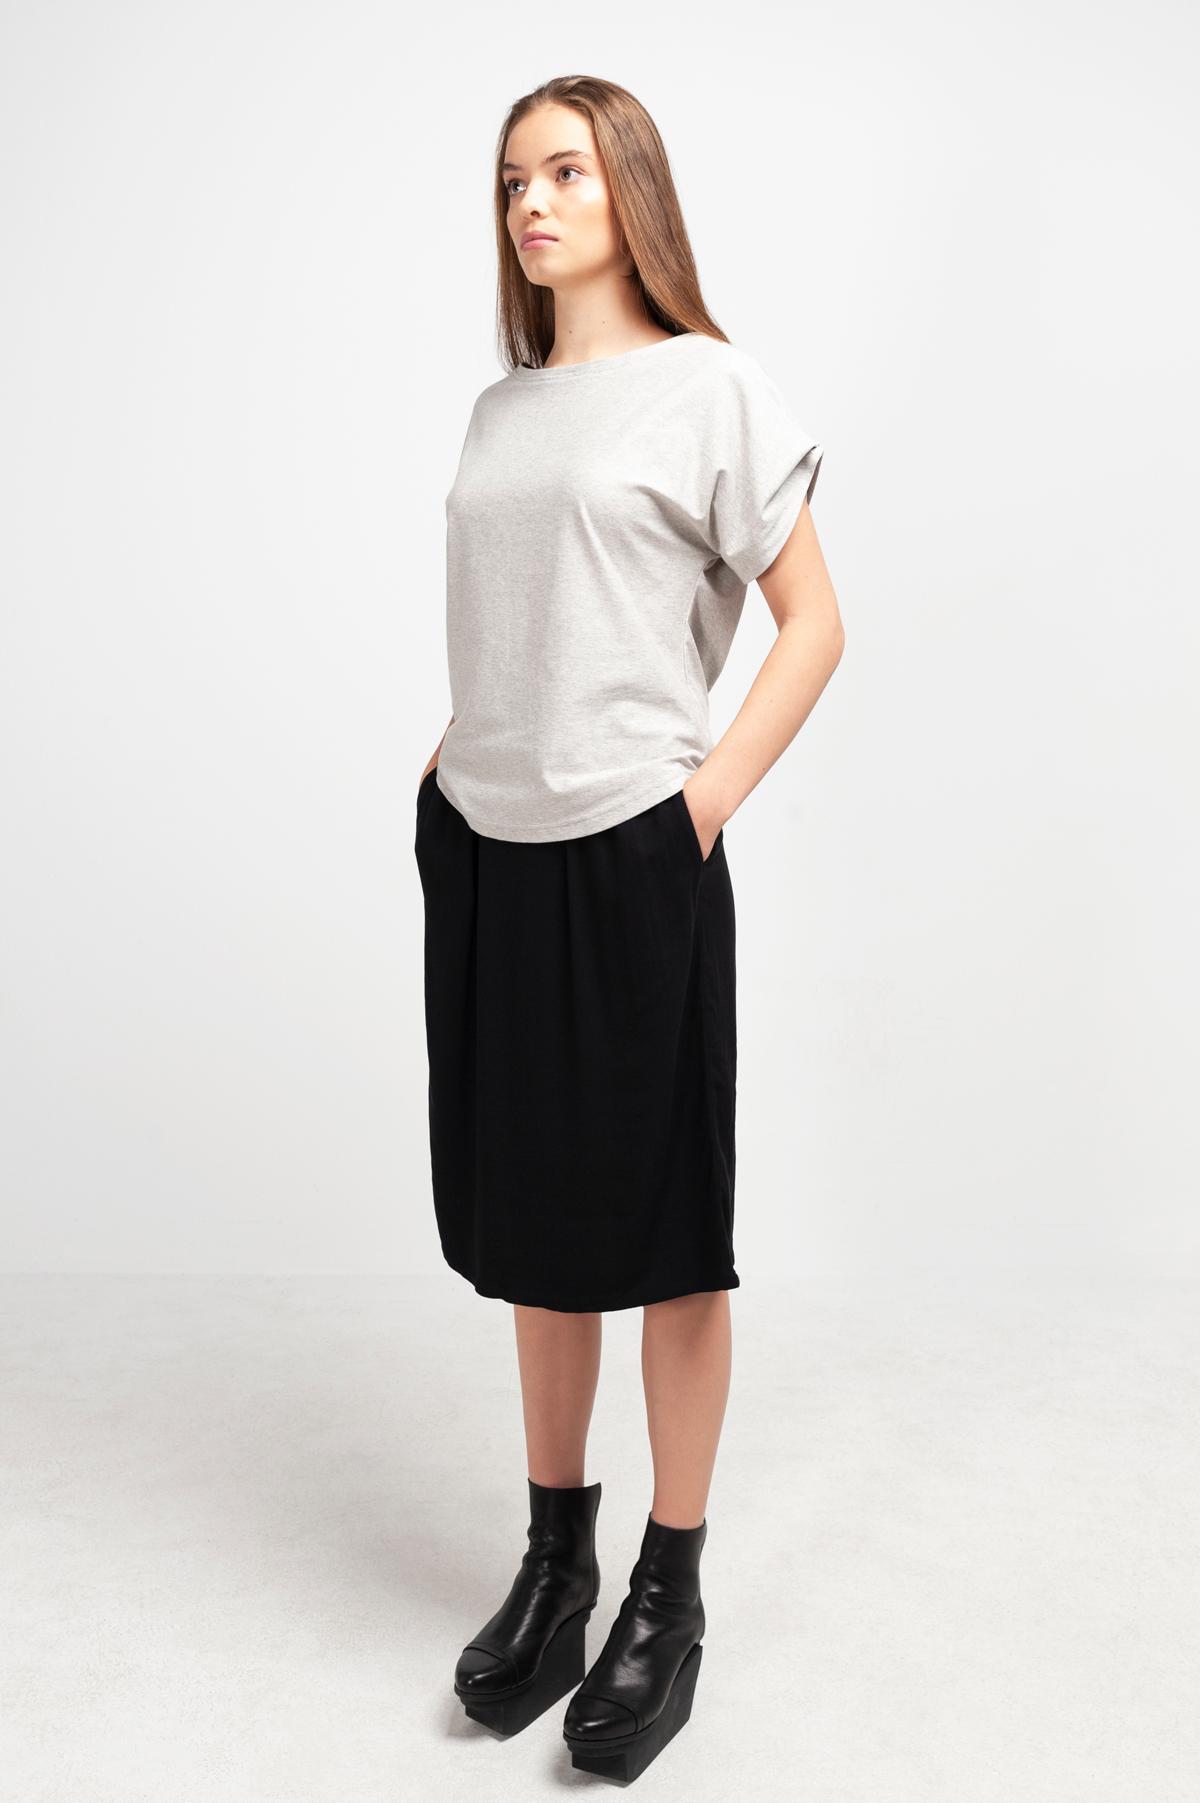 Roberta Organic Fashion Shipsheip T Shirt Ellie Blouse Grau Meliert (3)